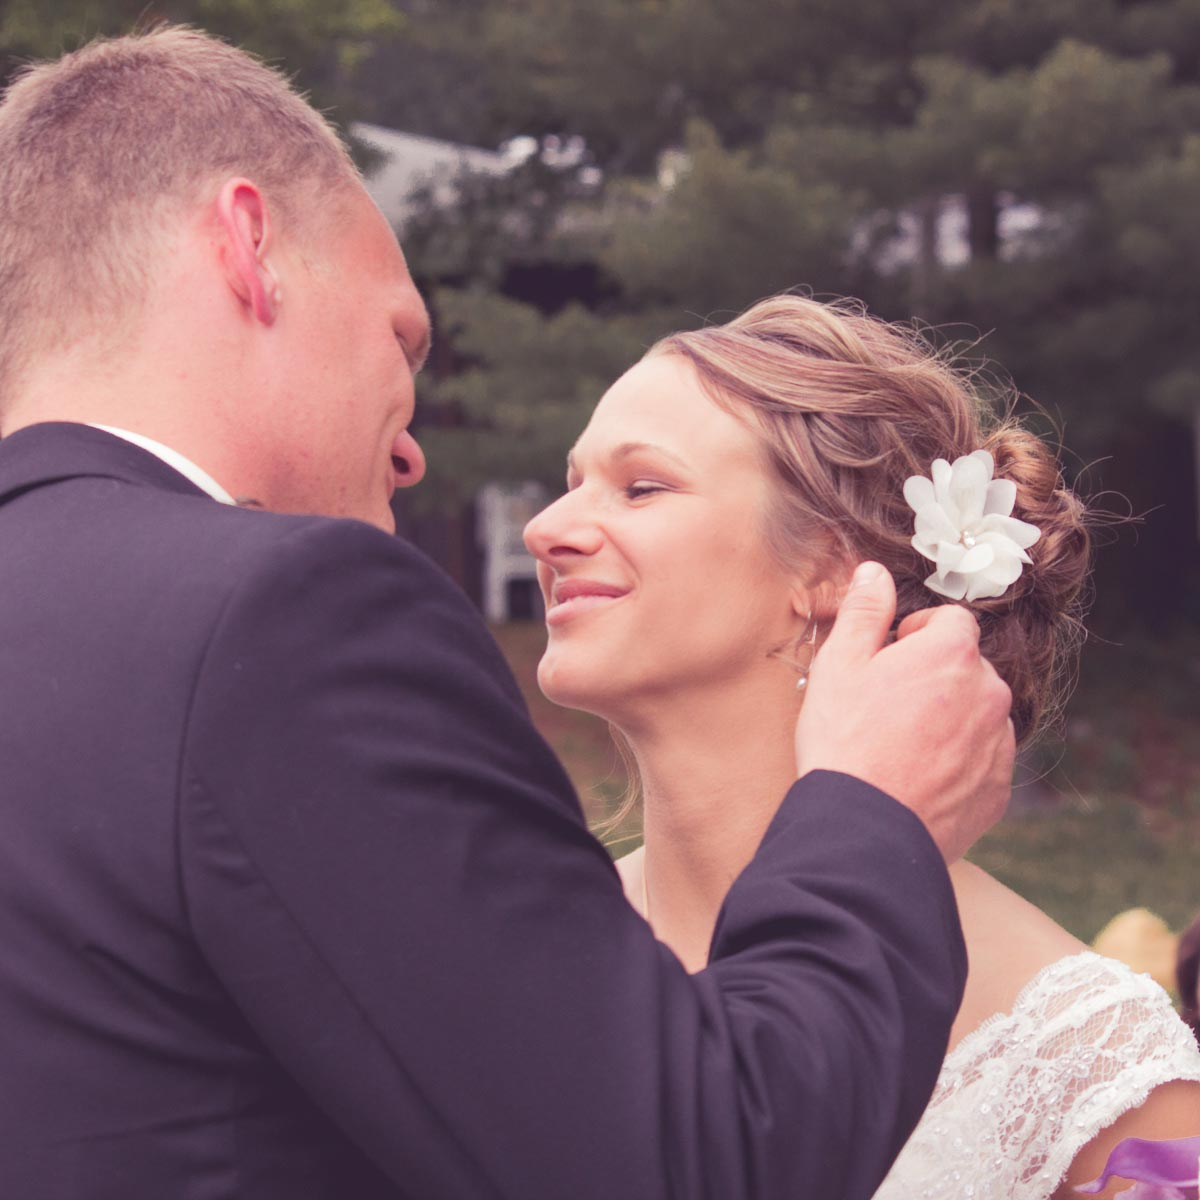 evansville-wedding-photographer-pabst-photo-kokies-echo-valley-(75)